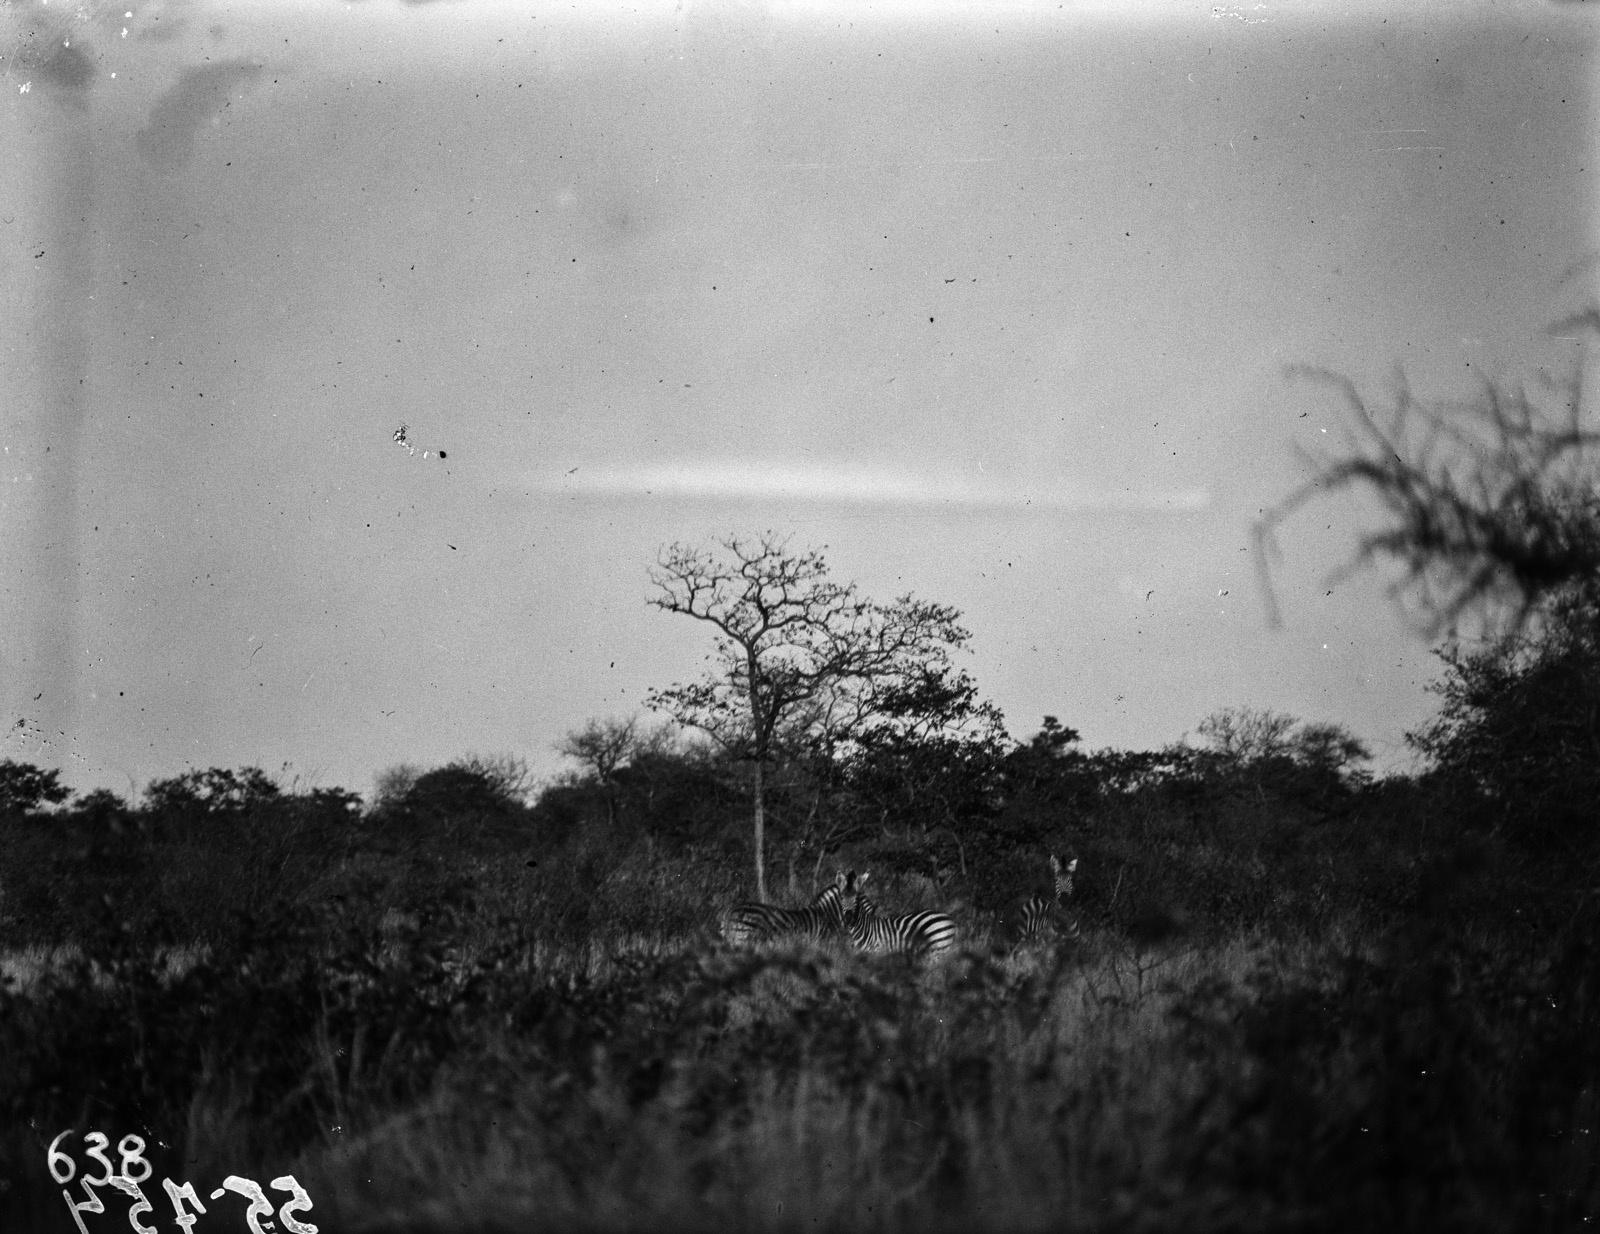 Национальный парк Крюгера. Зебры в саванне